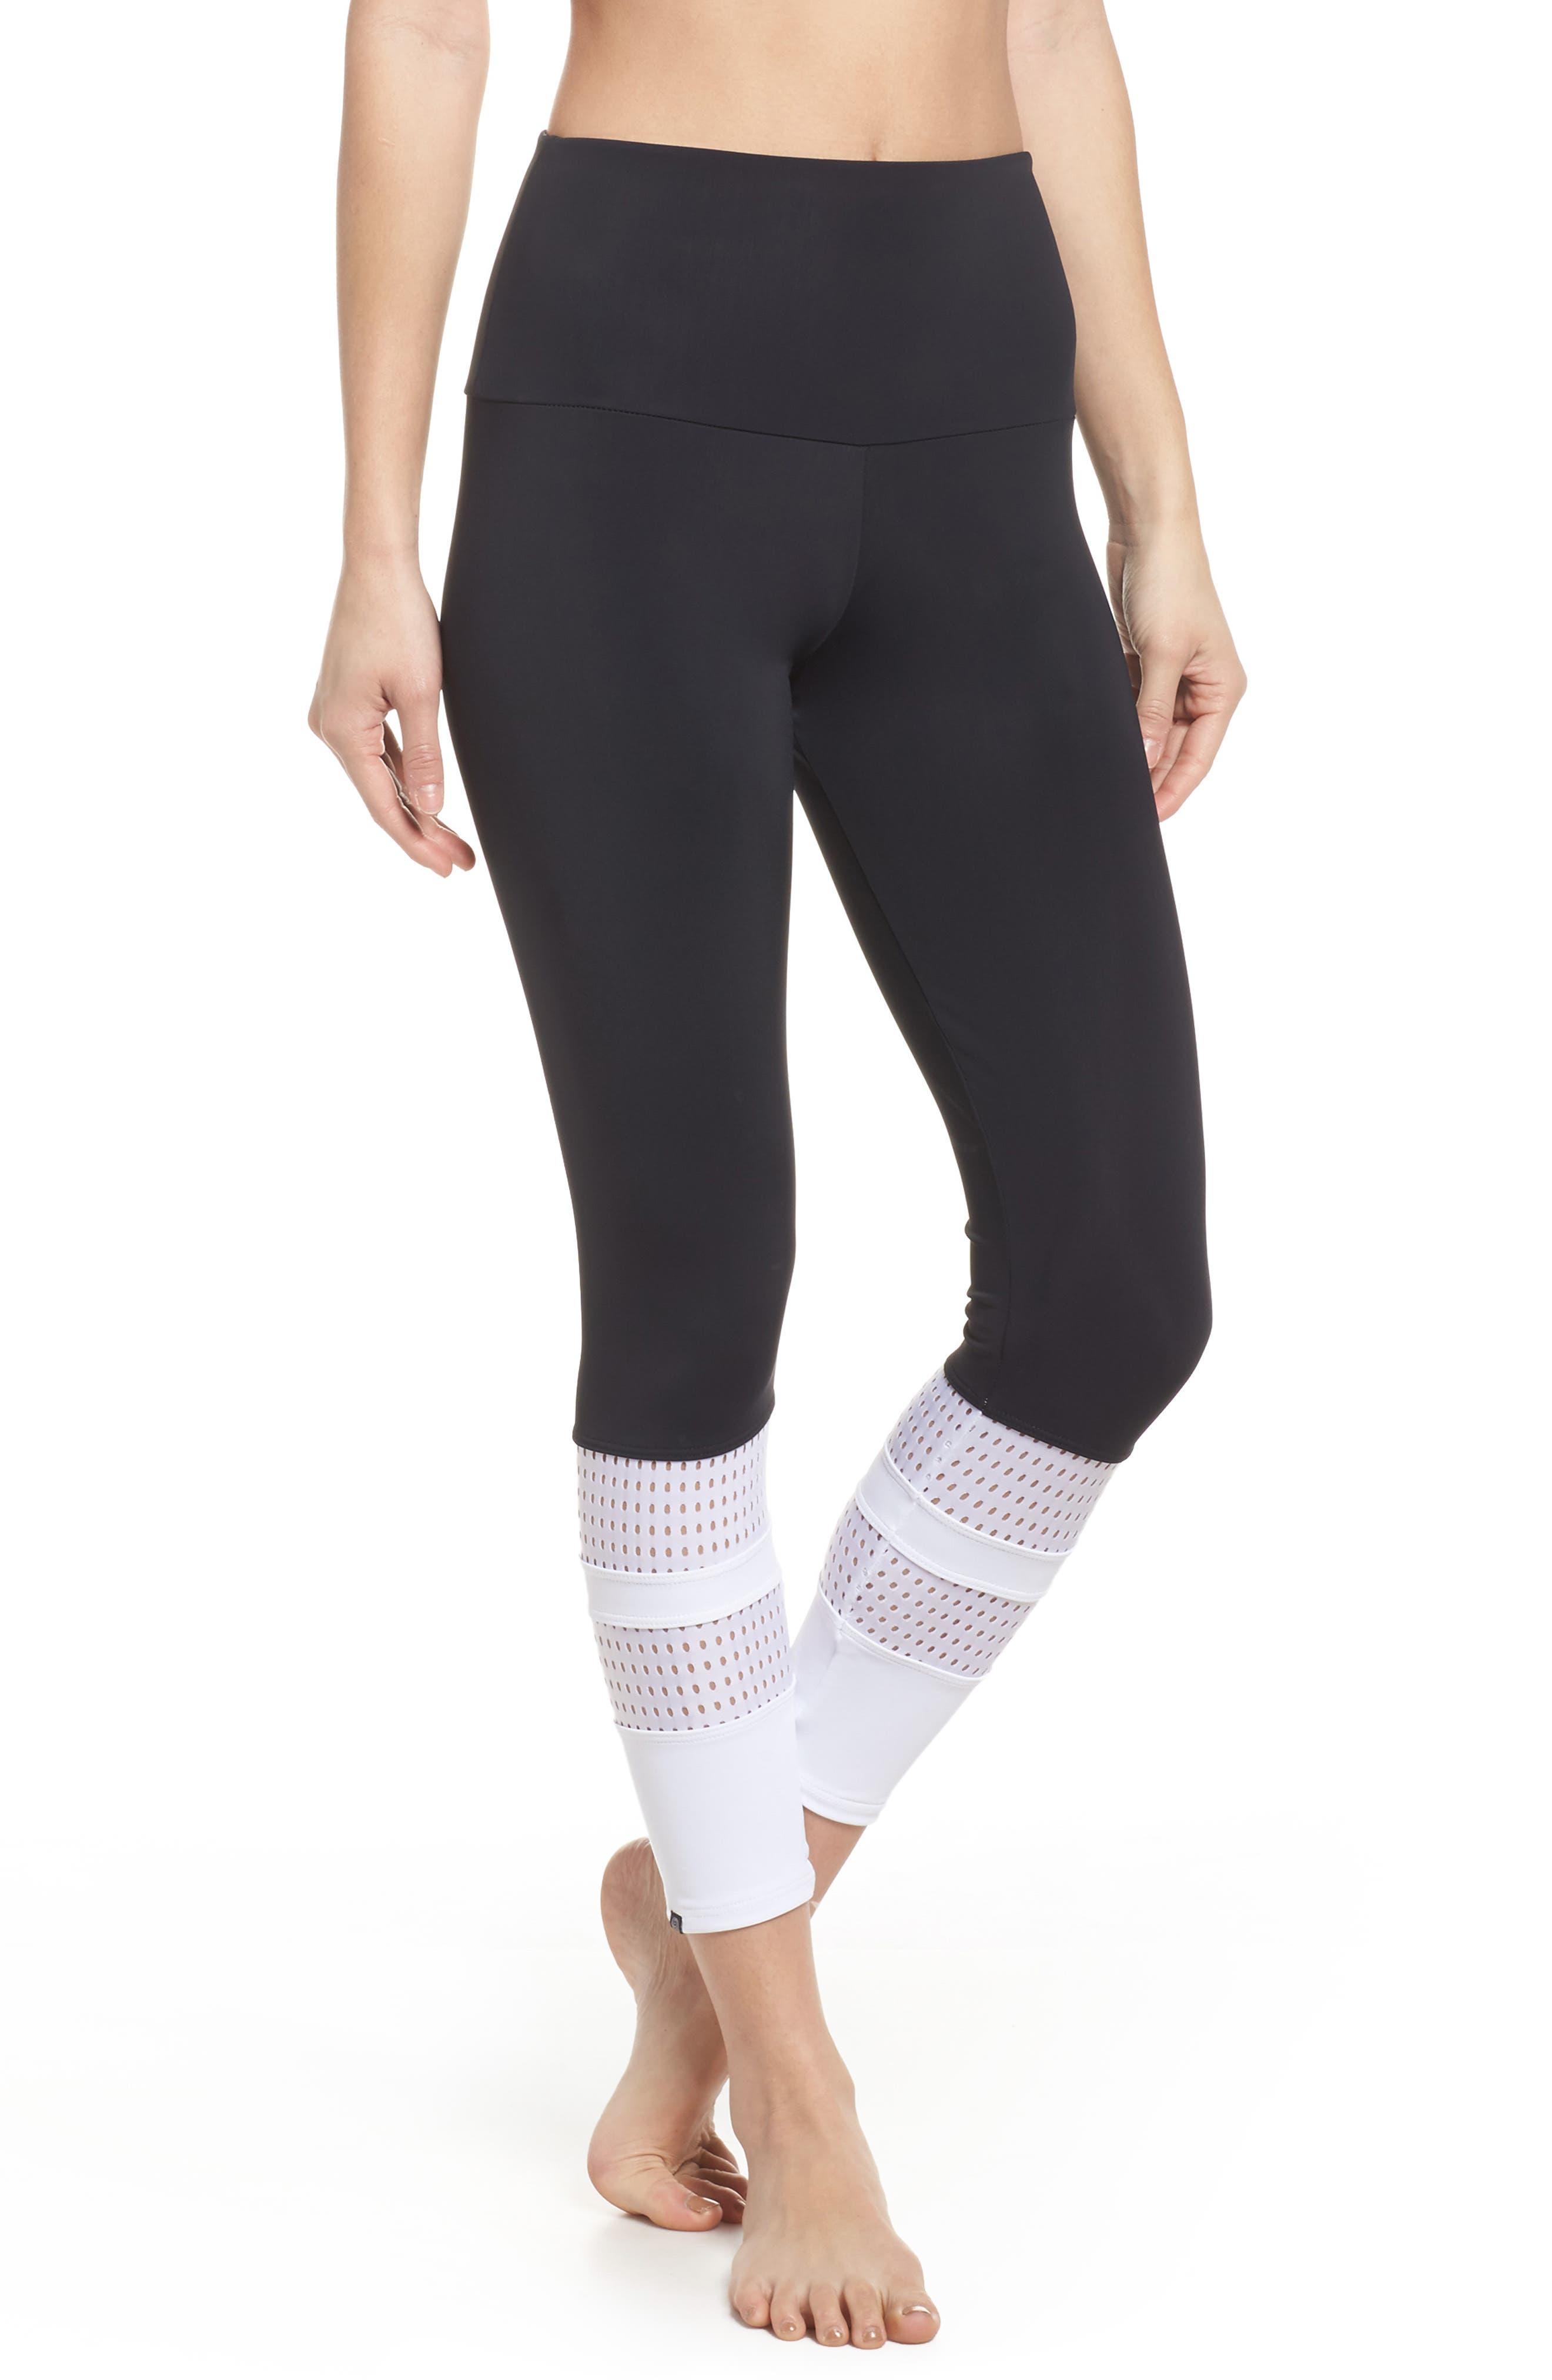 Half / Half 2.0 Legging in Black. - size M/L (also in S/M,XS/S) Onzie